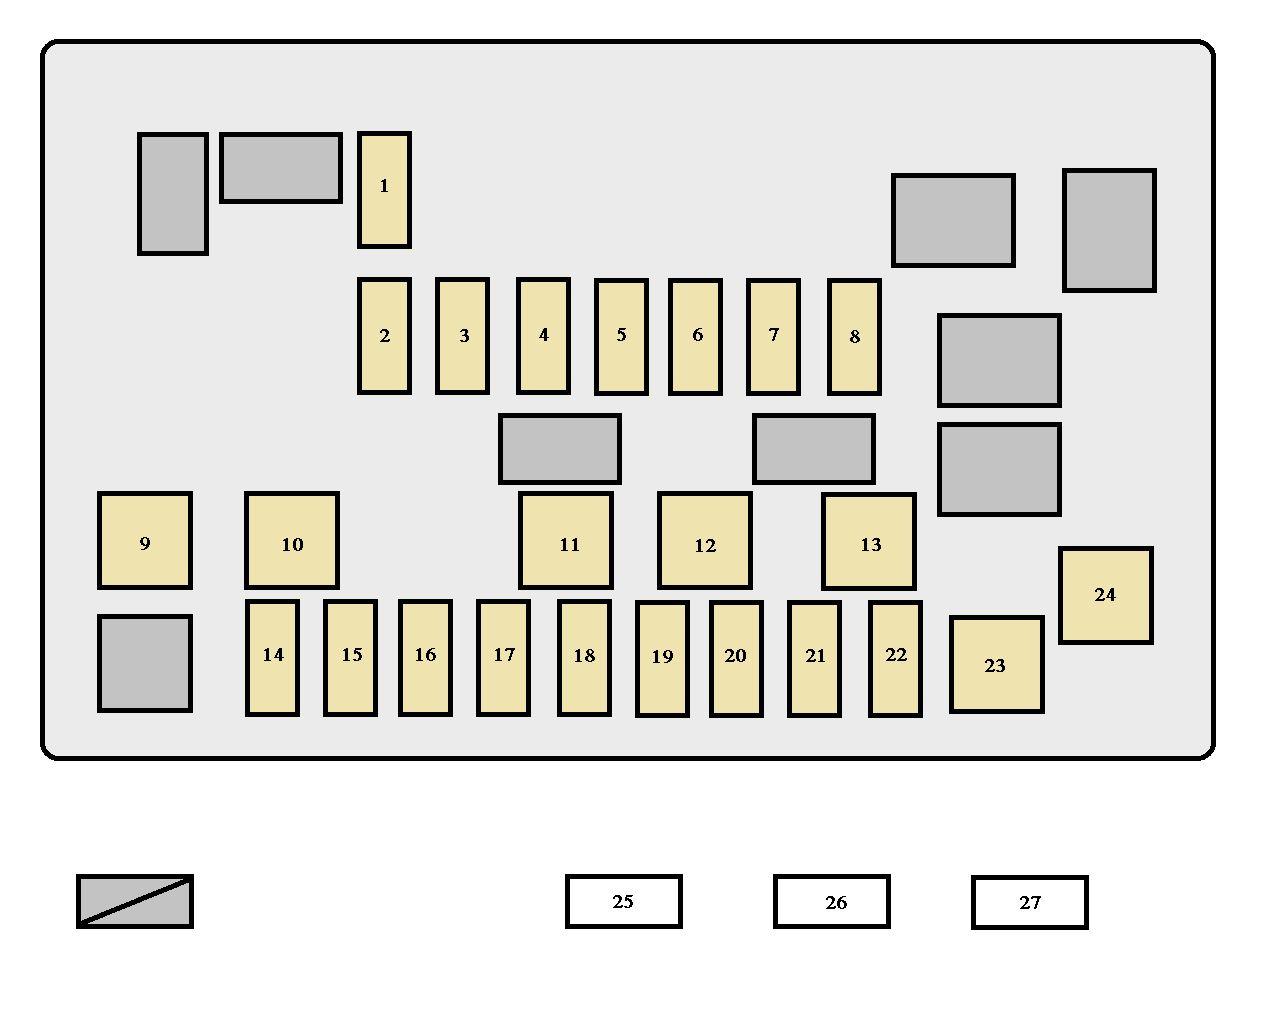 2015 Scion Tc Fuse Diagram Browse Data Wiring 2014 Acadia Ac Hub Xb Box